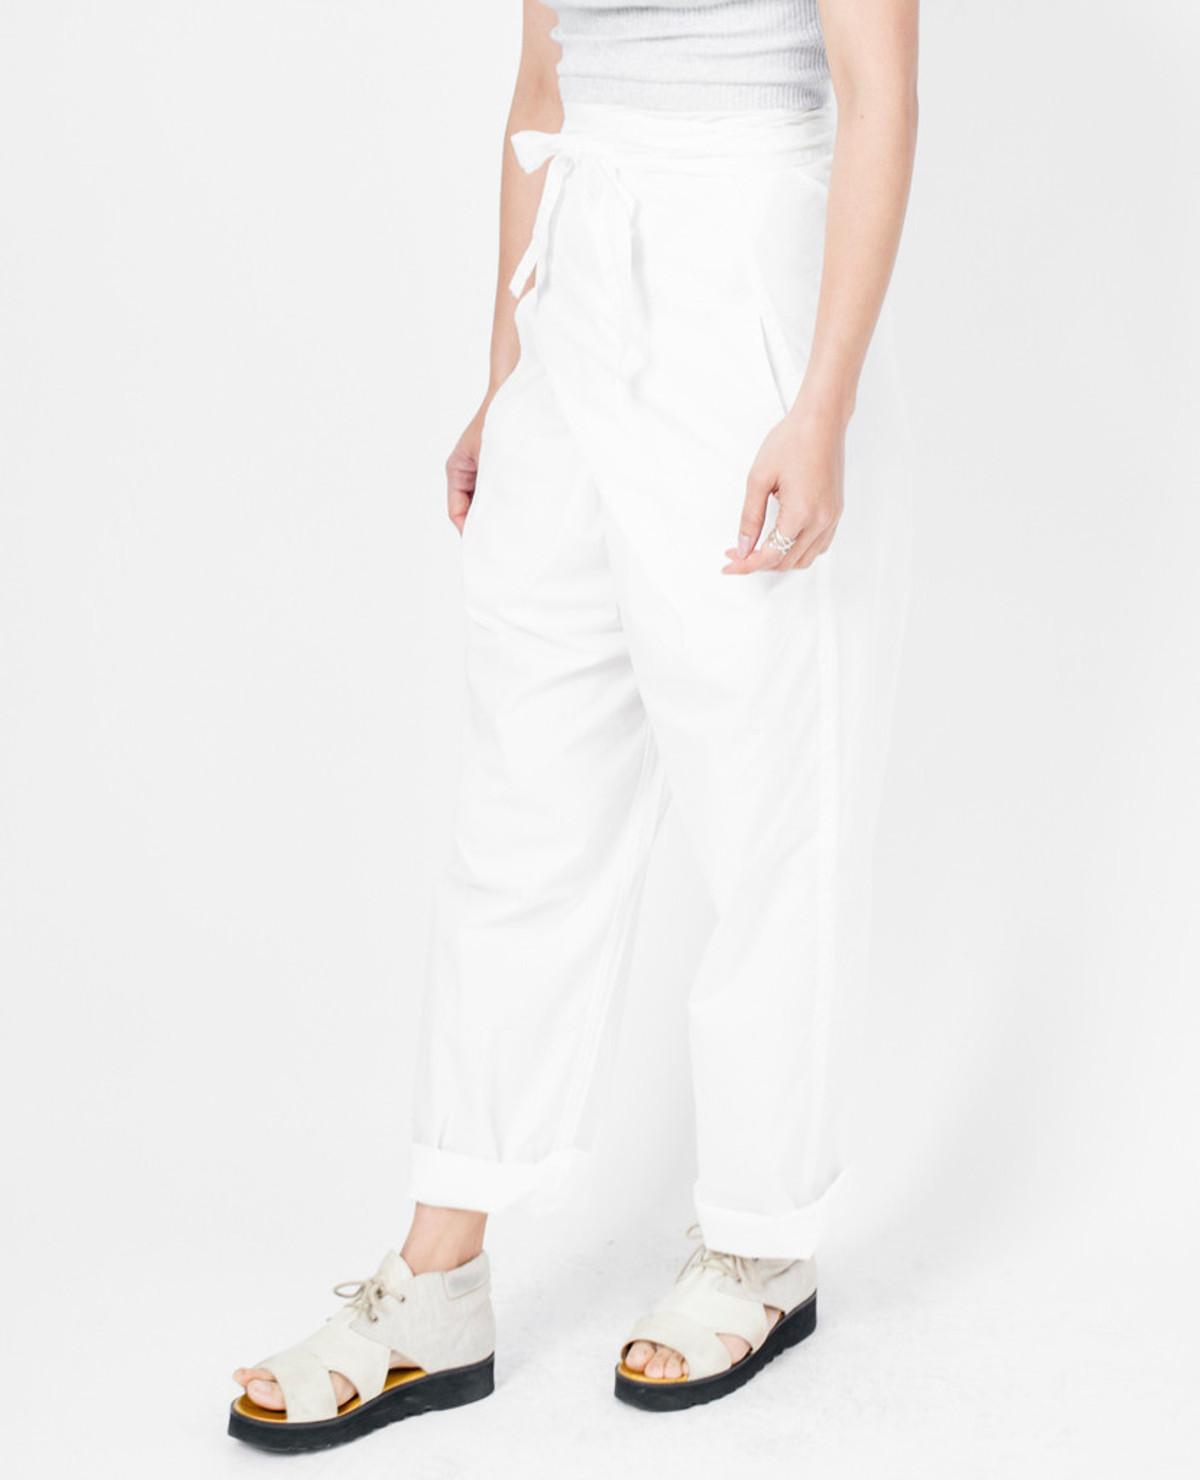 Cosmic Wonder Basic Pants - White